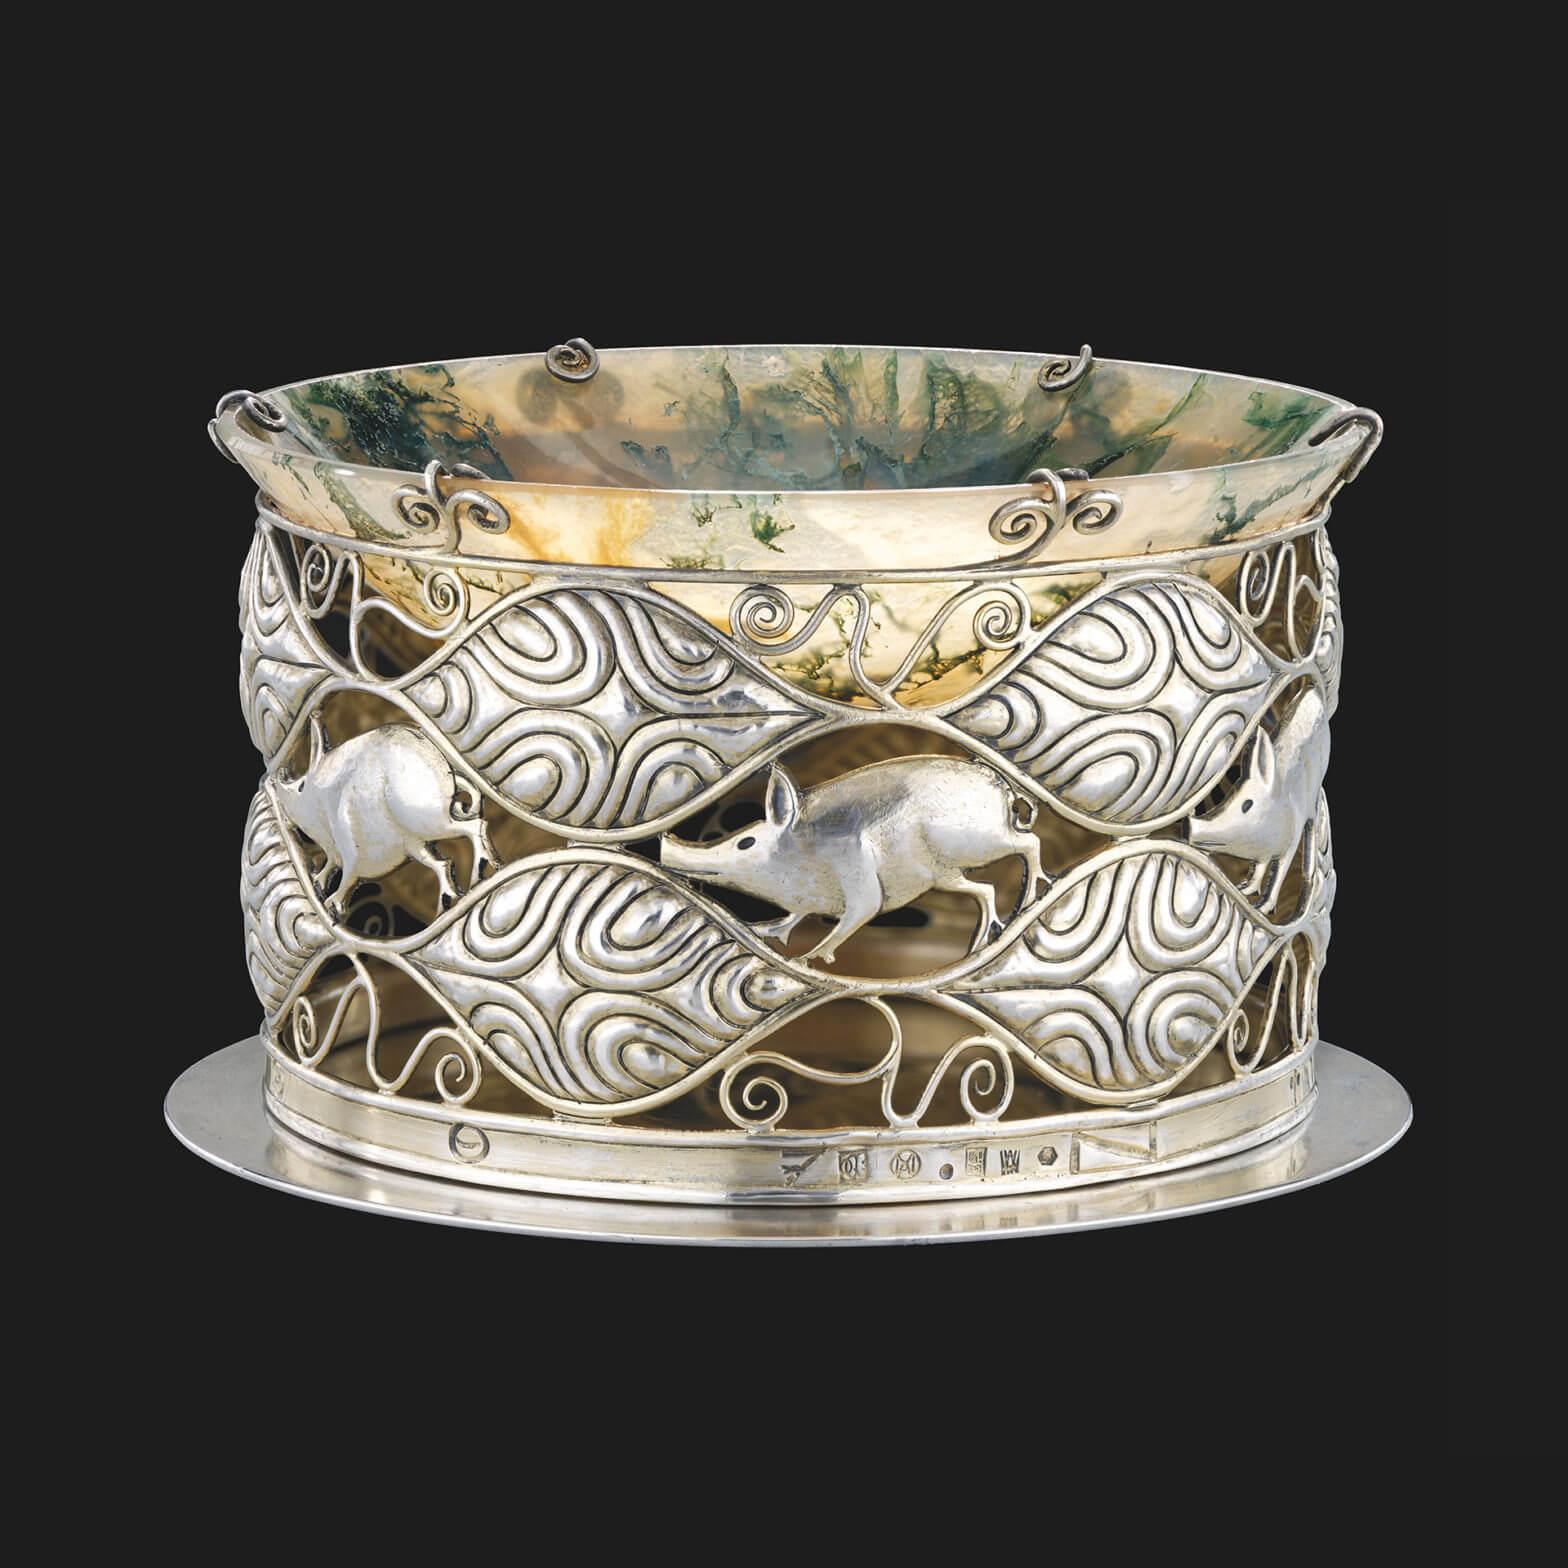 Carl Otto Czeschka - Jewelry bowl model n° S 983